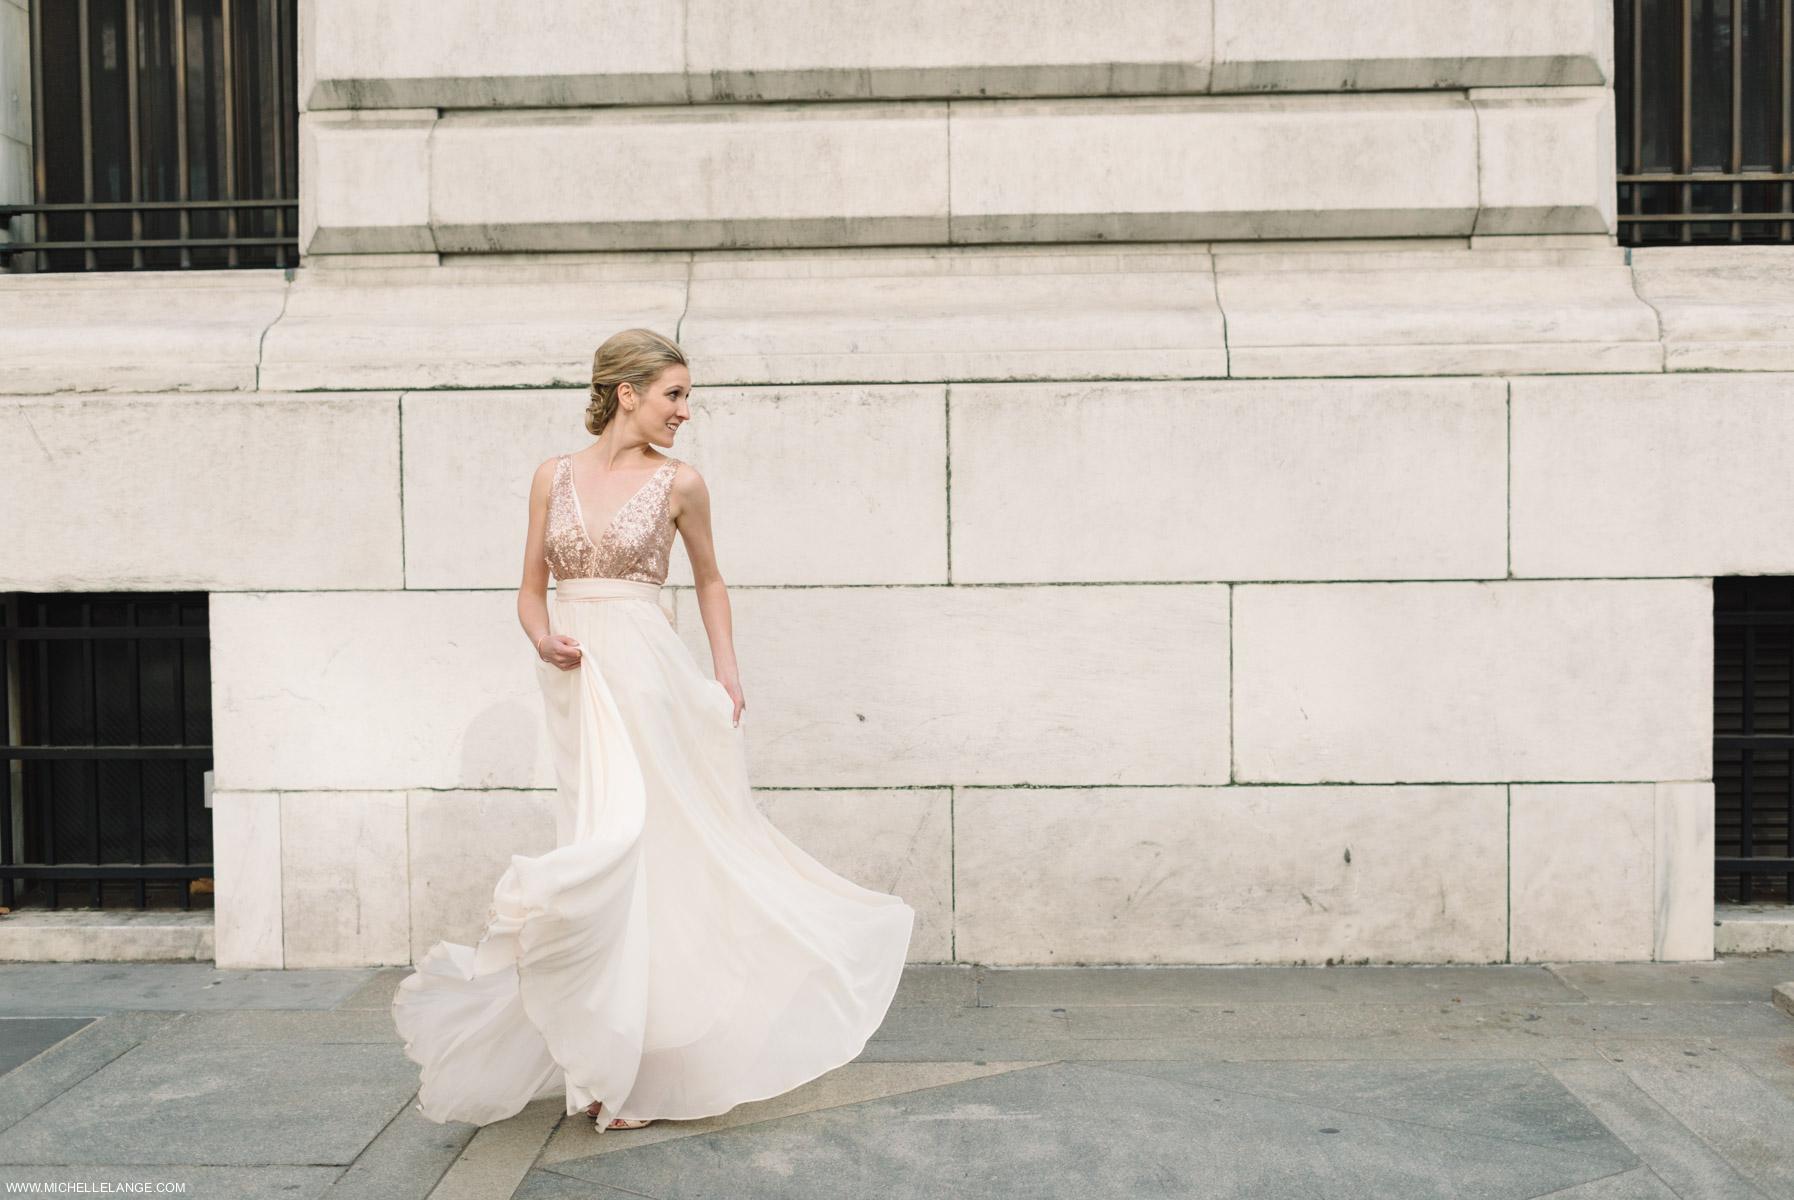 NYC New York Public Library Wedding Photographer